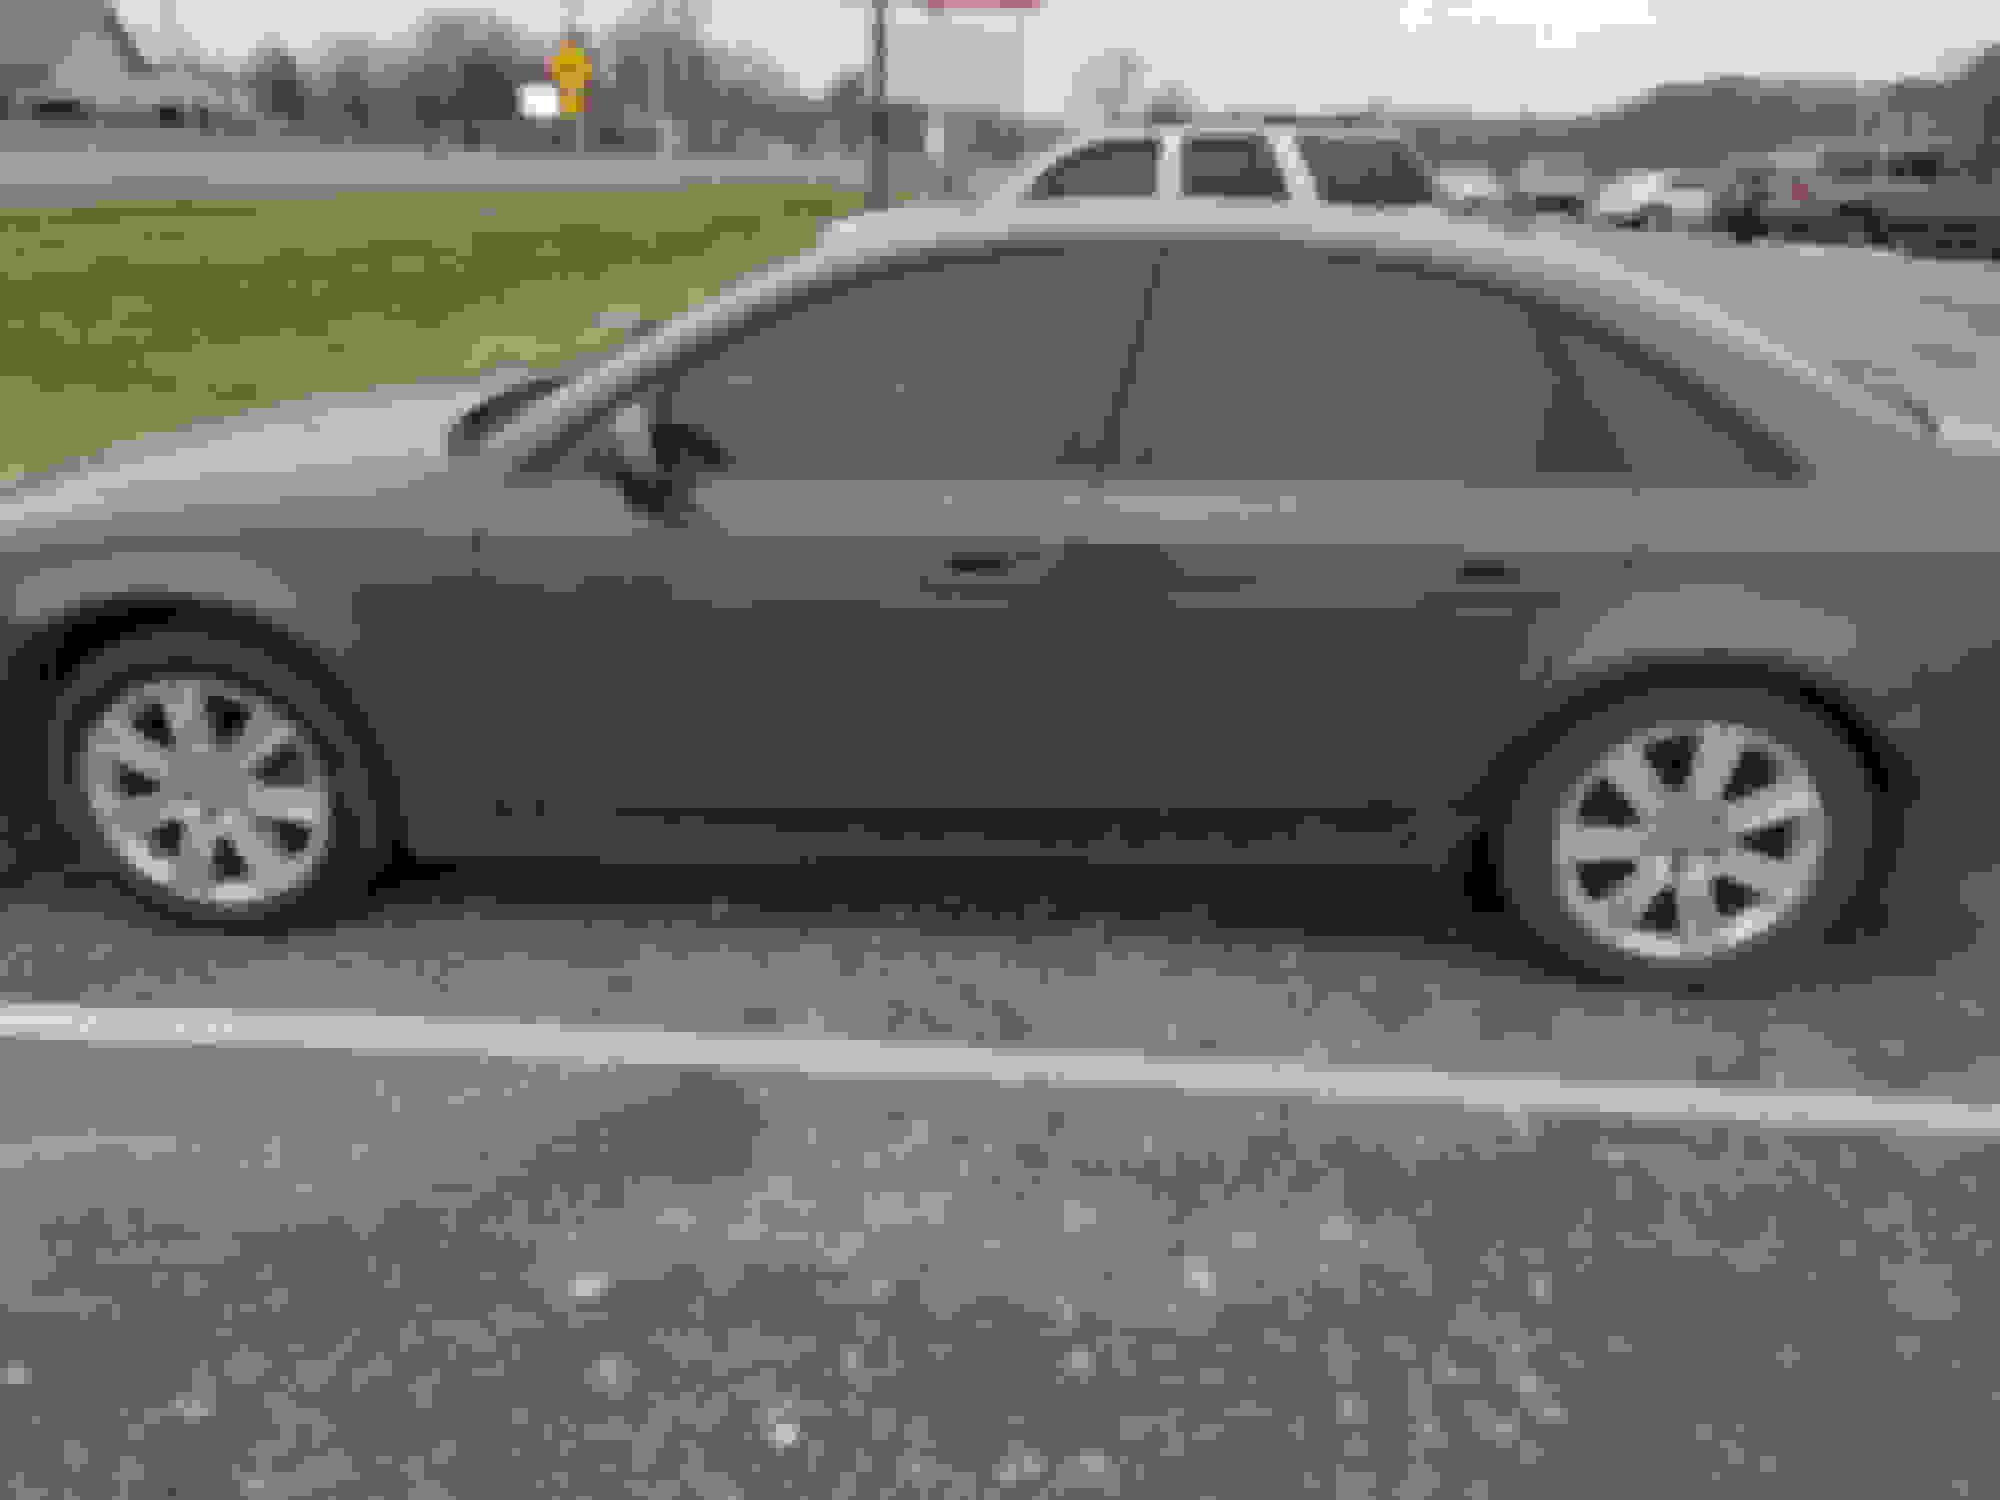 Audi A4 B8 2013 Rear sun shade clip broken - AudiWorld Forums